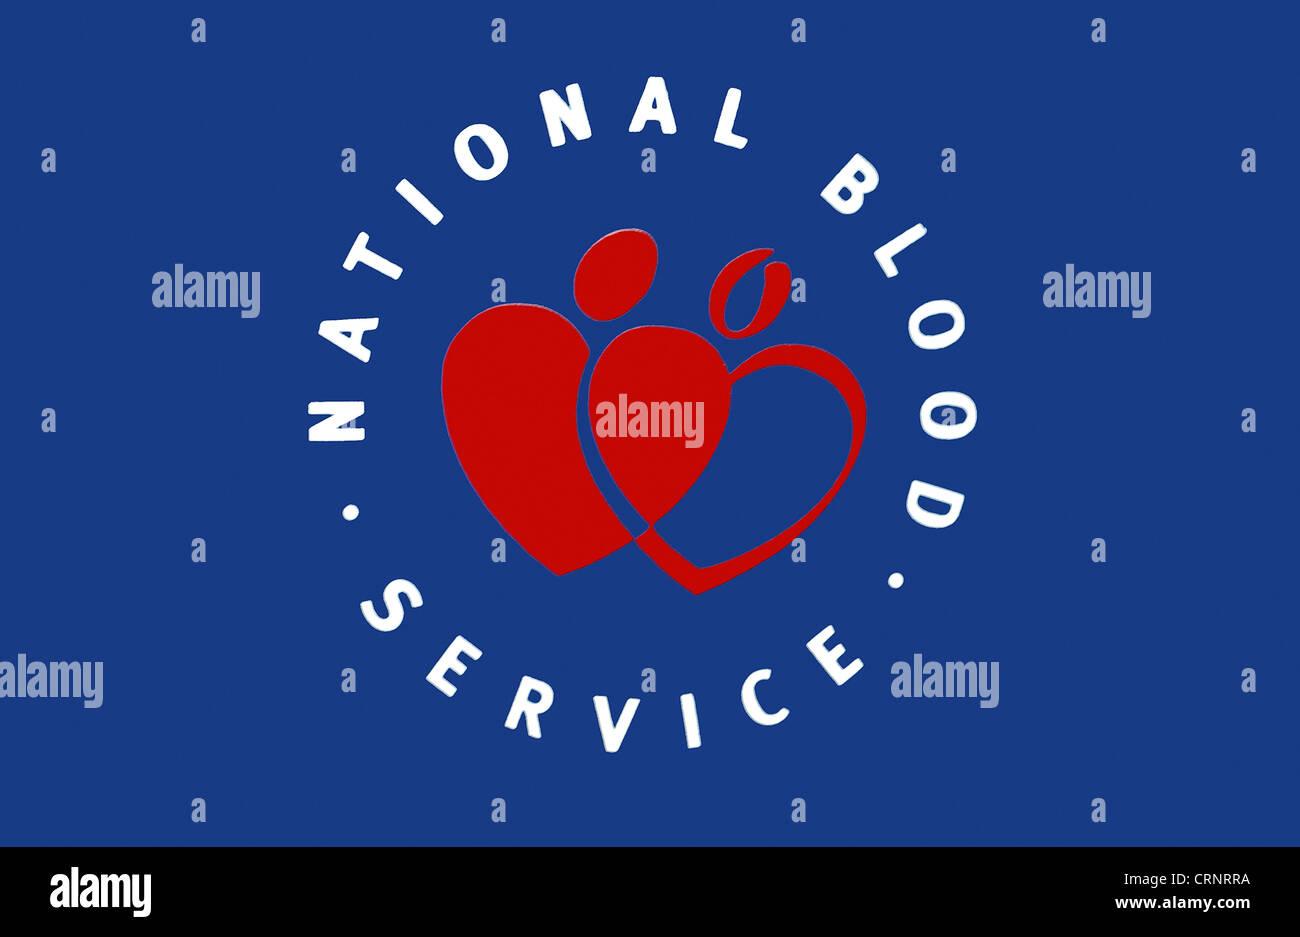 National Blood Service logo. - Stock Image